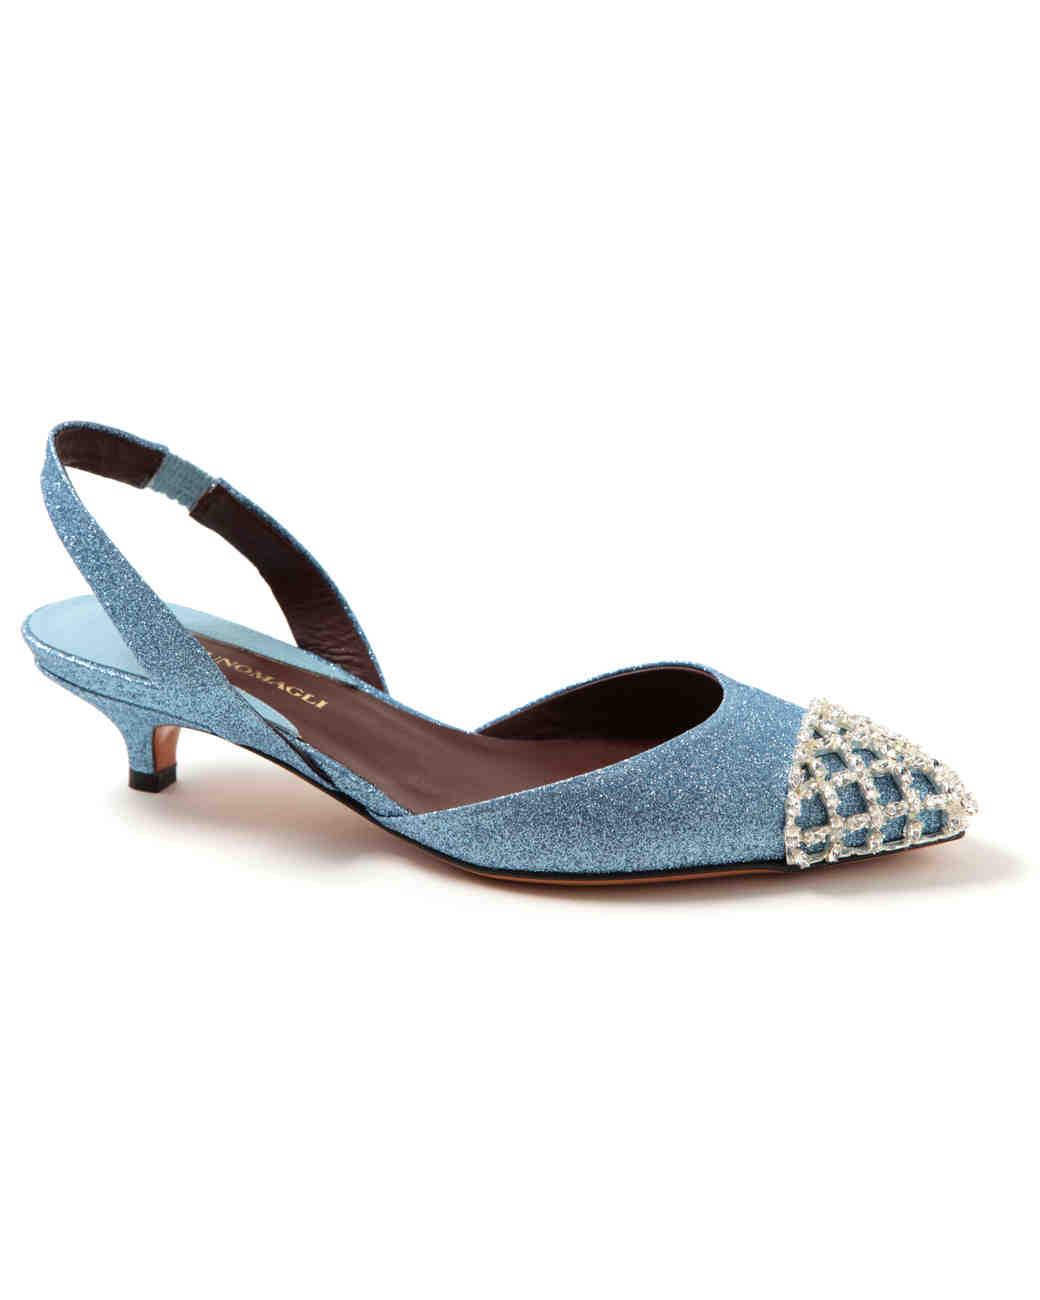 bruno-magli-shoes-msw-fall13.jpg